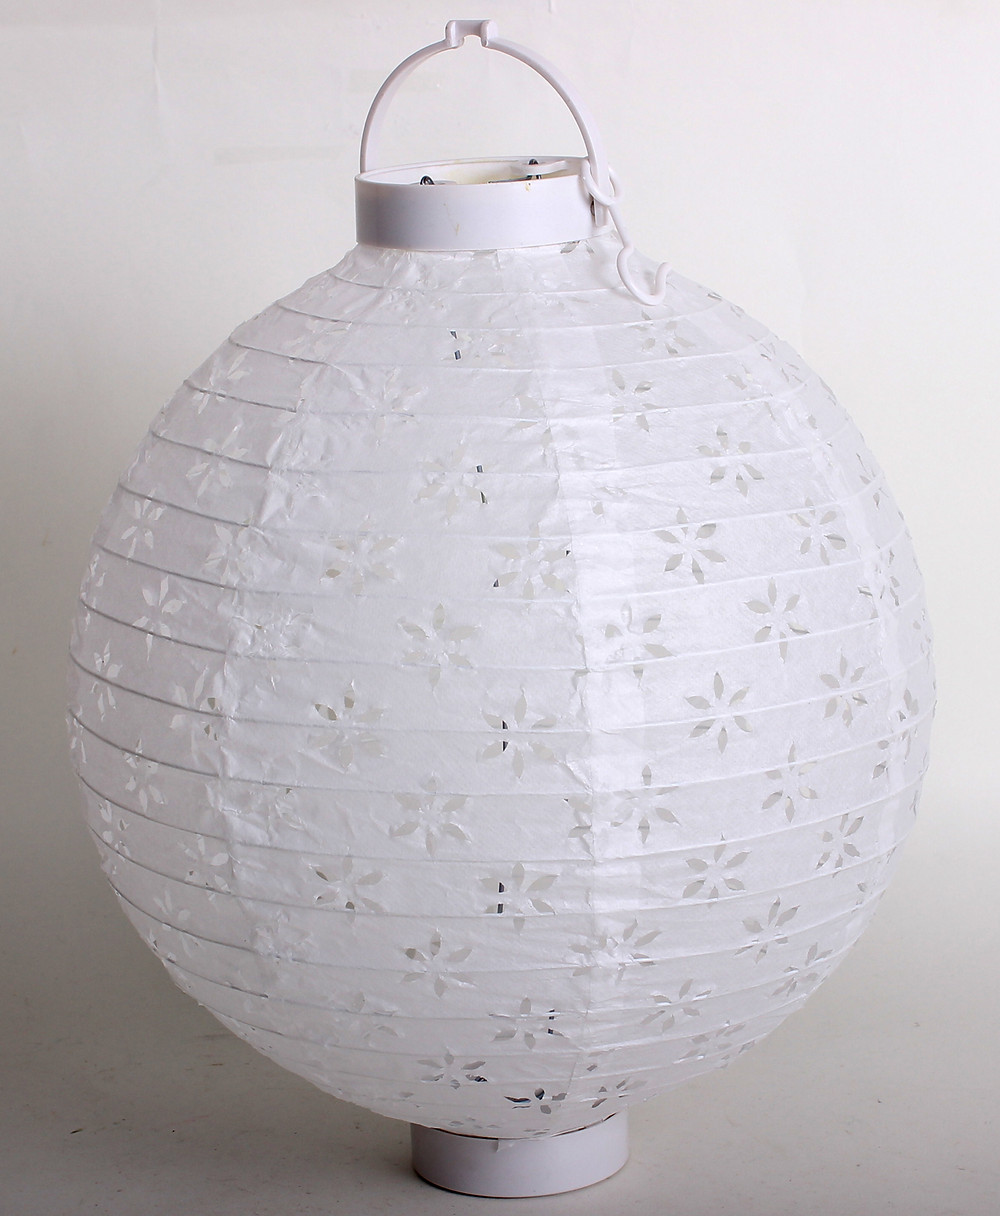 Lampionok - kerti party dekor nagyker